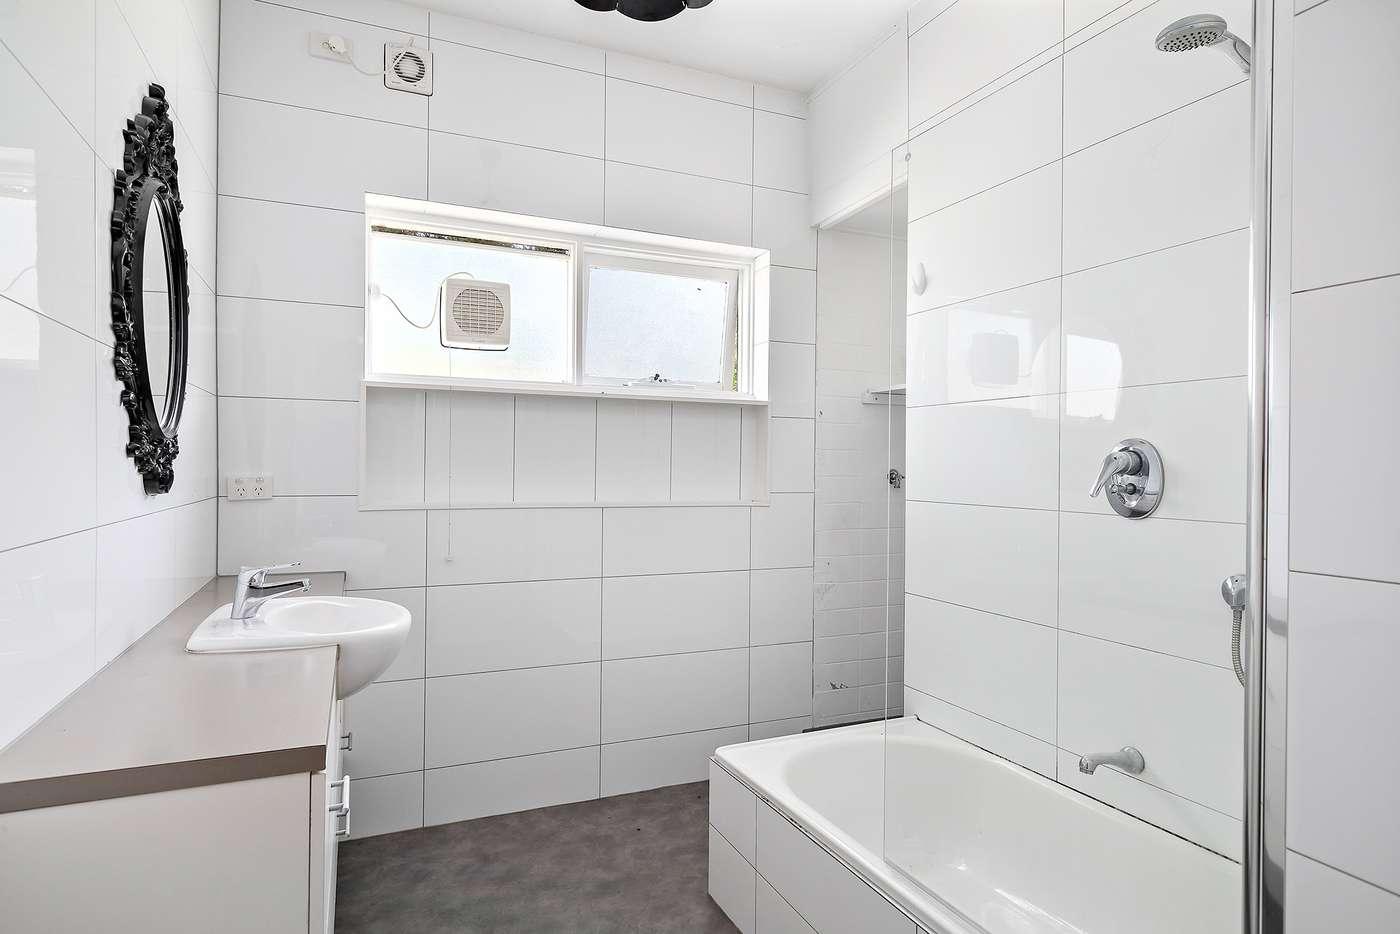 Sixth view of Homely apartment listing, 4/297 St Kilda Street, Brighton VIC 3186